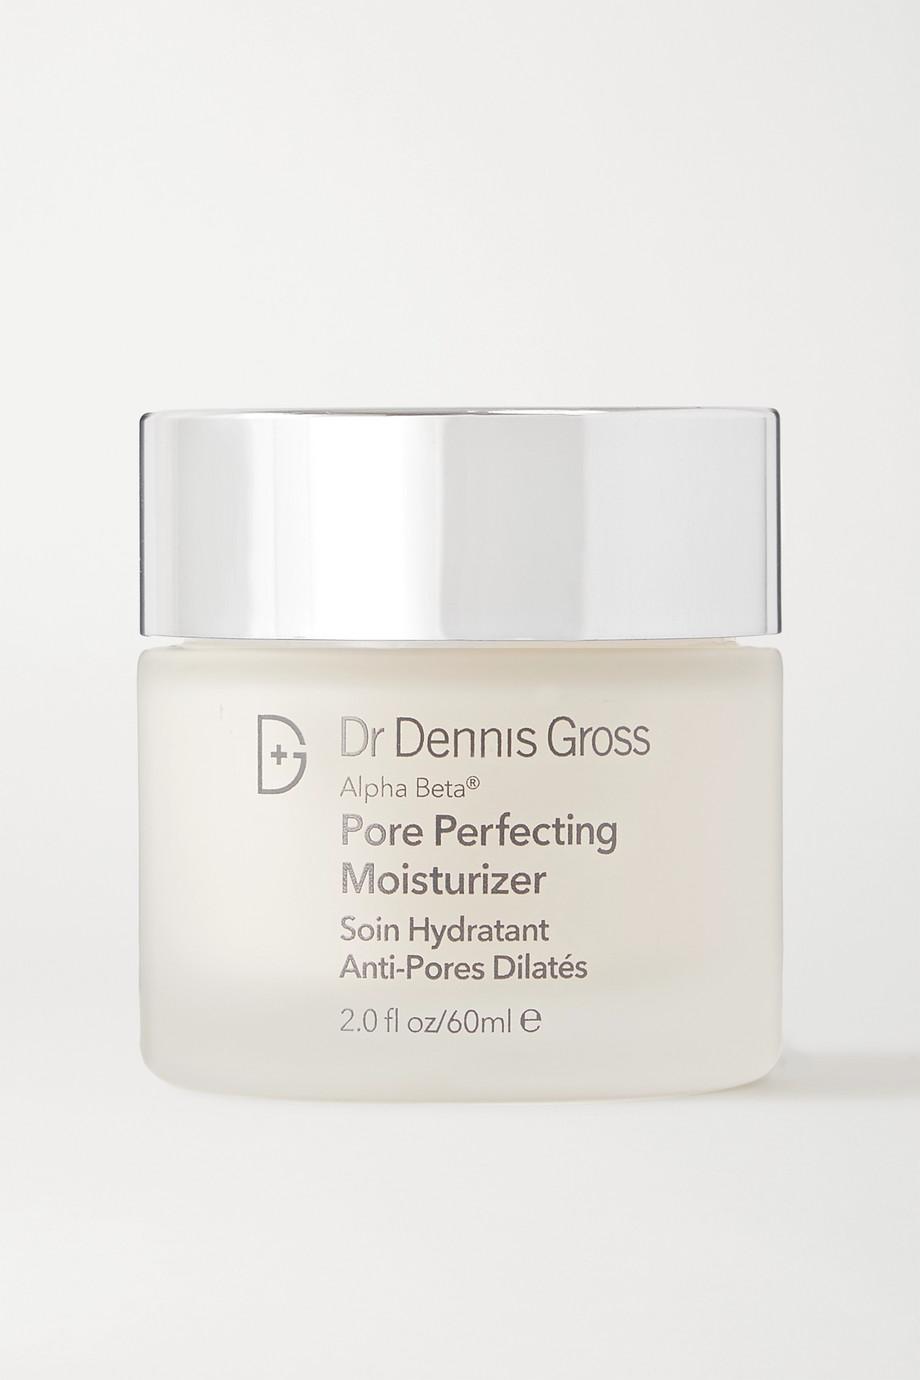 Dr. Dennis Gross Skincare Soin hydratant anti-pores dilatés Alpha Beta®, 60 ml